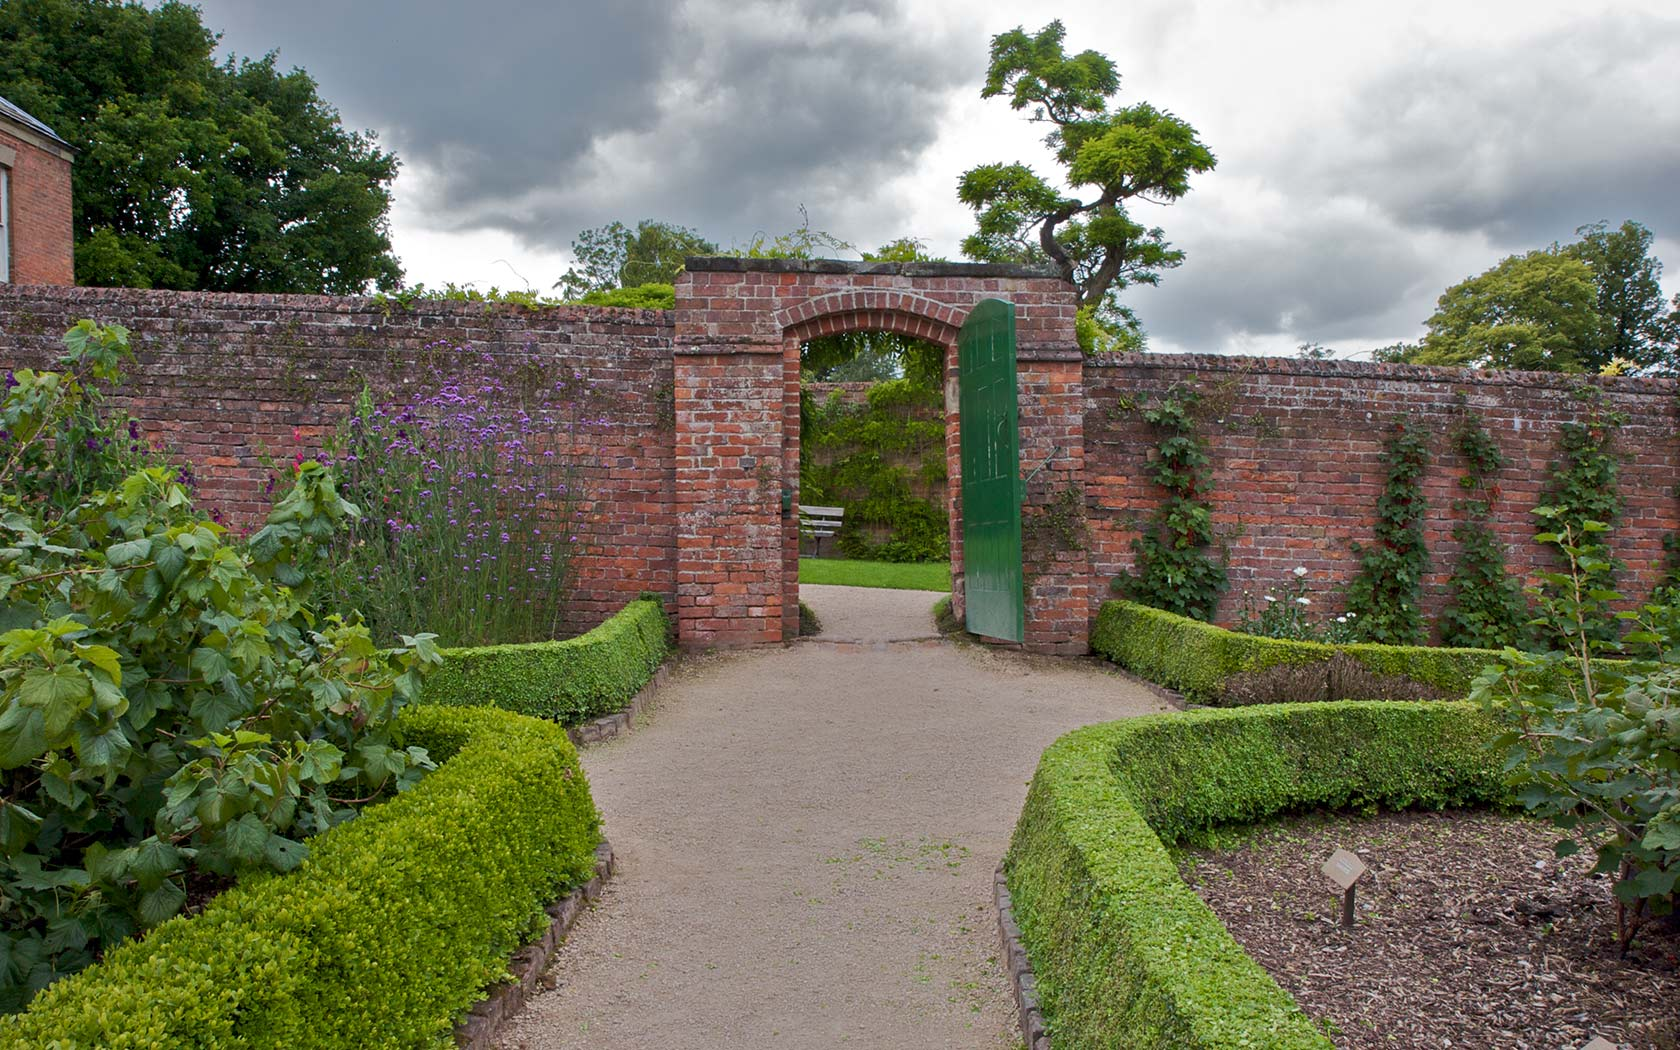 Garden Kitchen Entrance Calke Natures Images Abbey Backgrounds